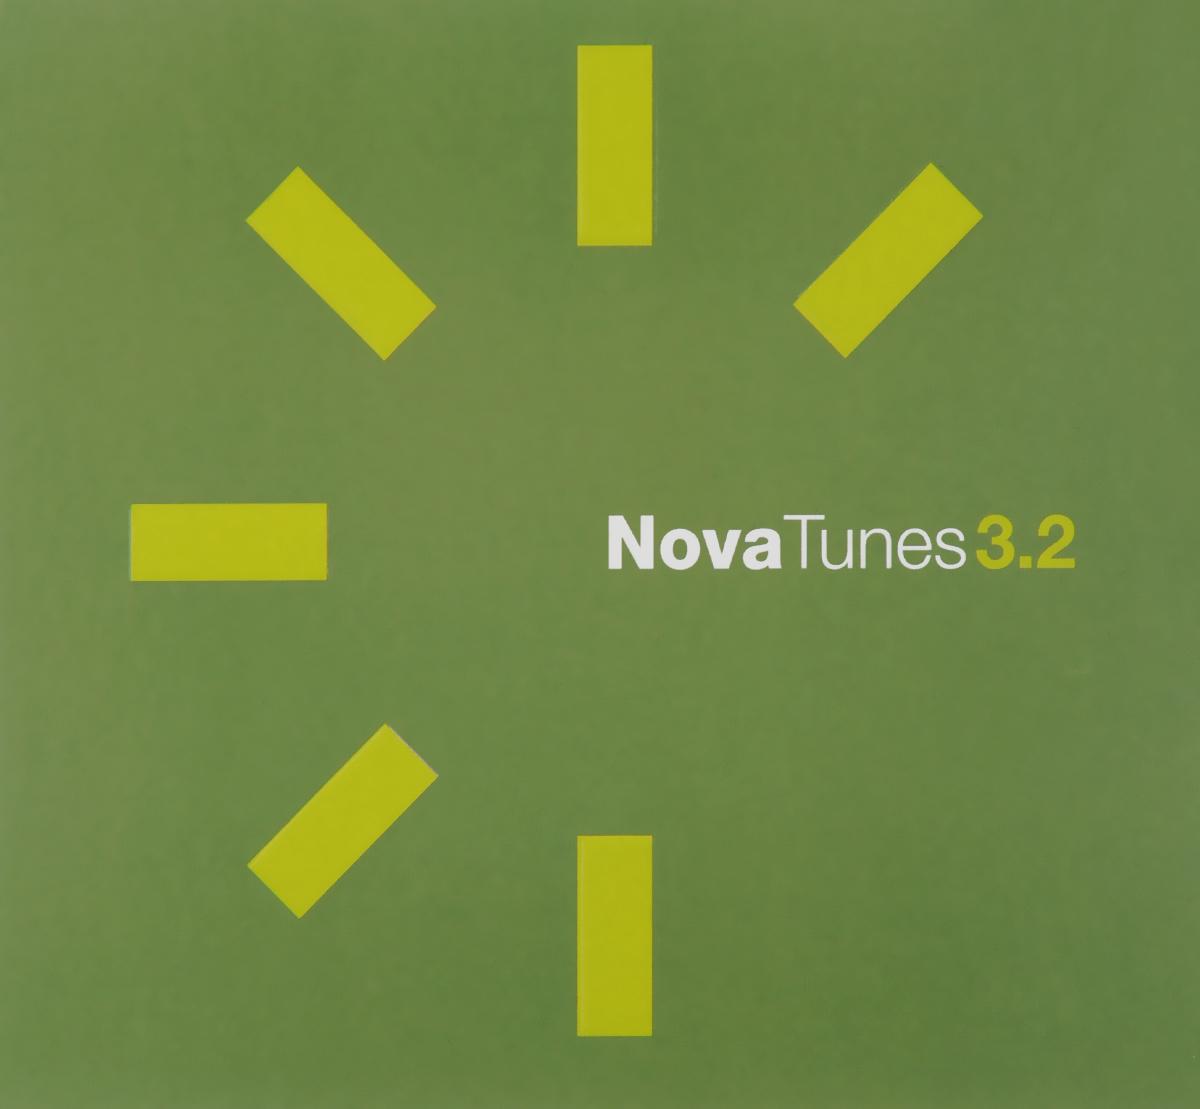 Nova Tunes 3.2